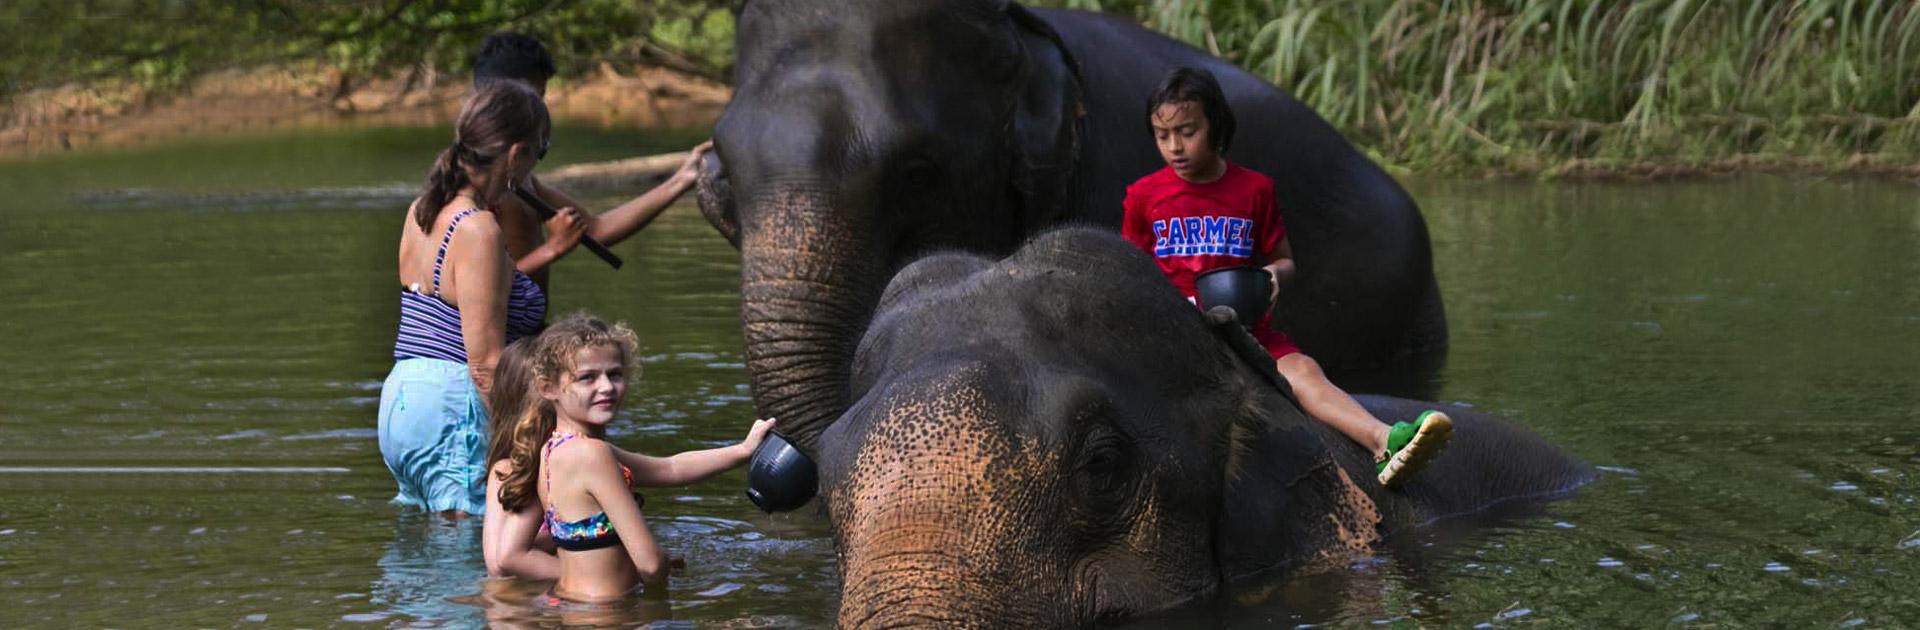 TH Tailandia en Familia con Phuket E 1